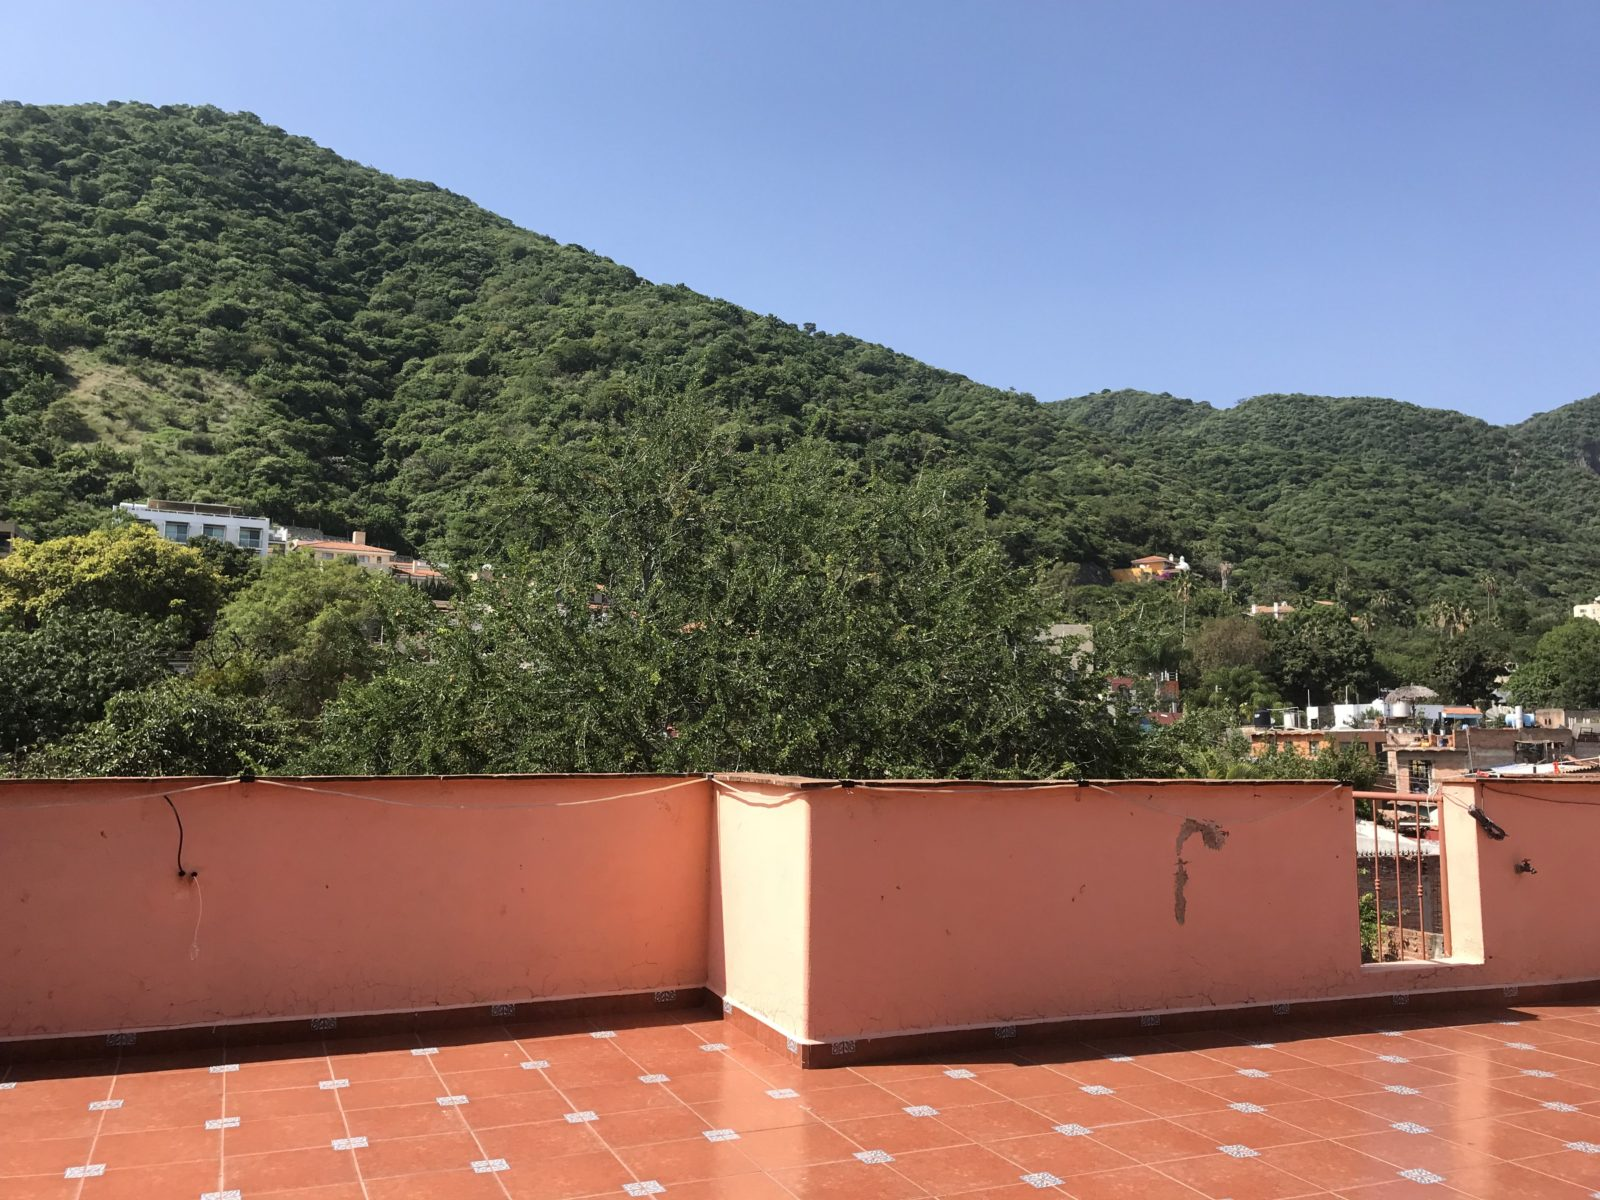 Sierra Madras from the rooftop in Ajijic